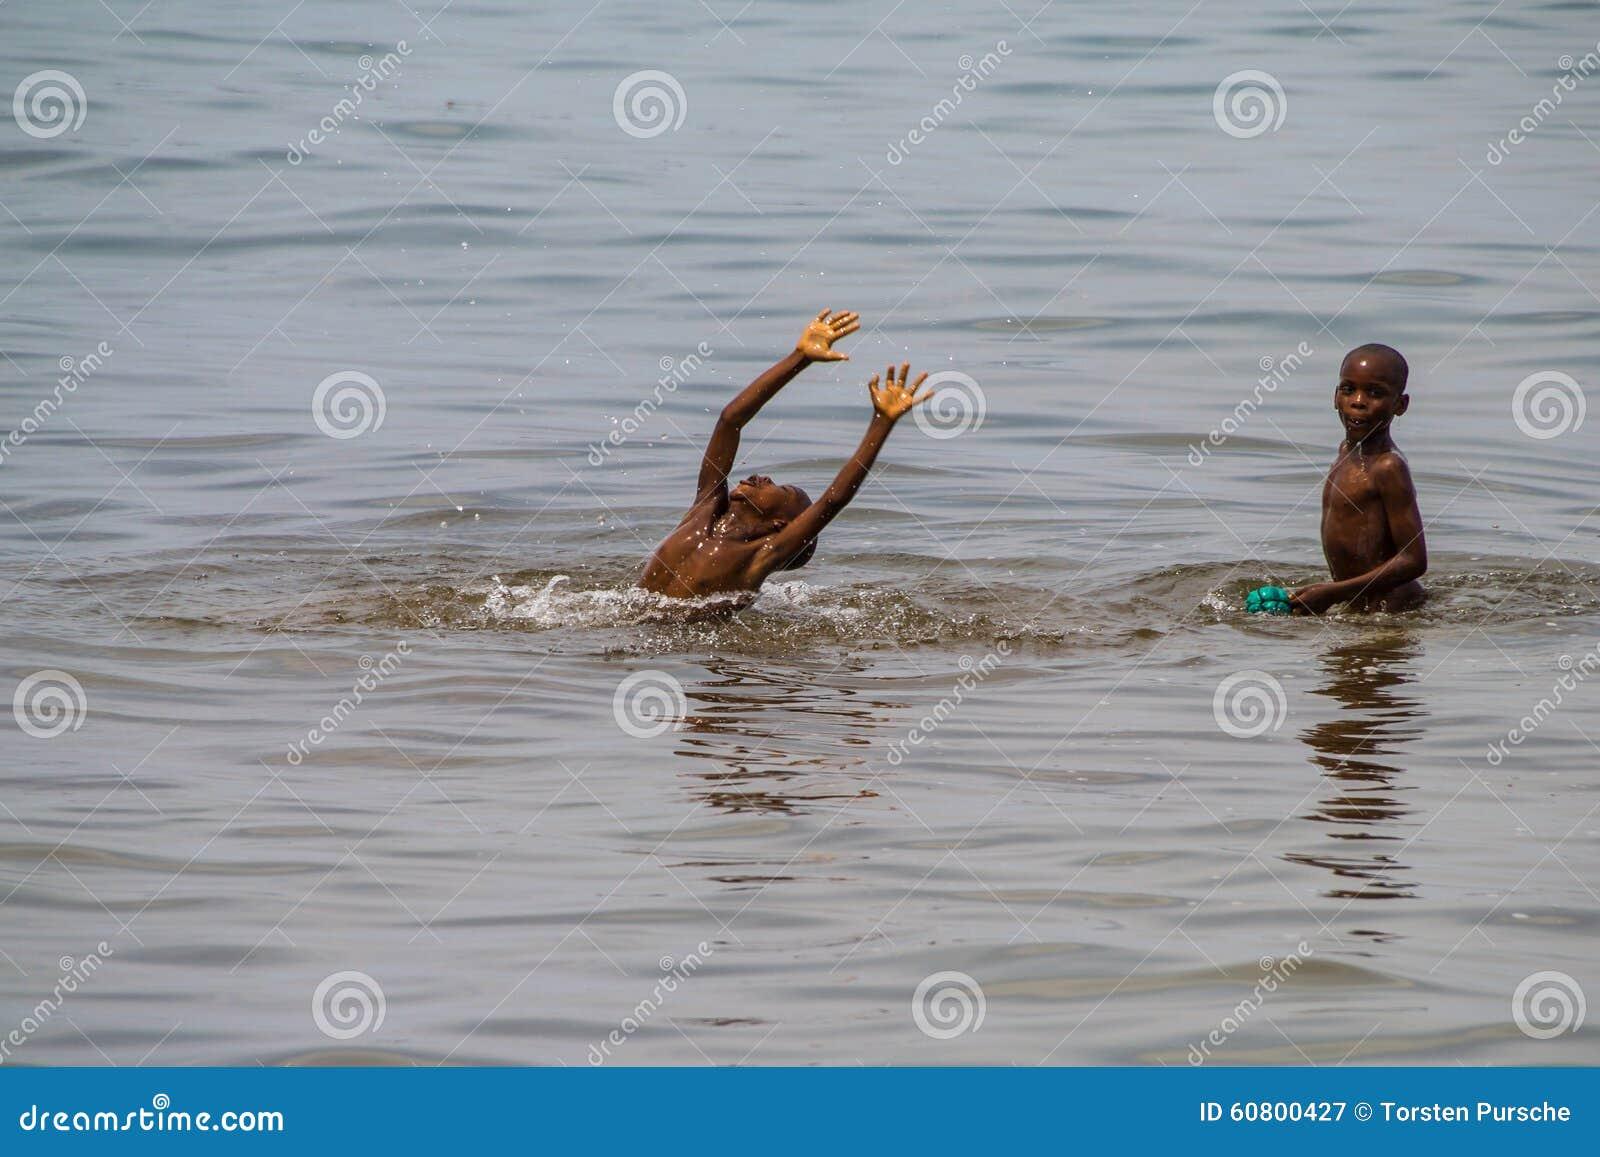 Kids Swimming In A Lake tanganyika kids swimming in the lake editorial photography - image